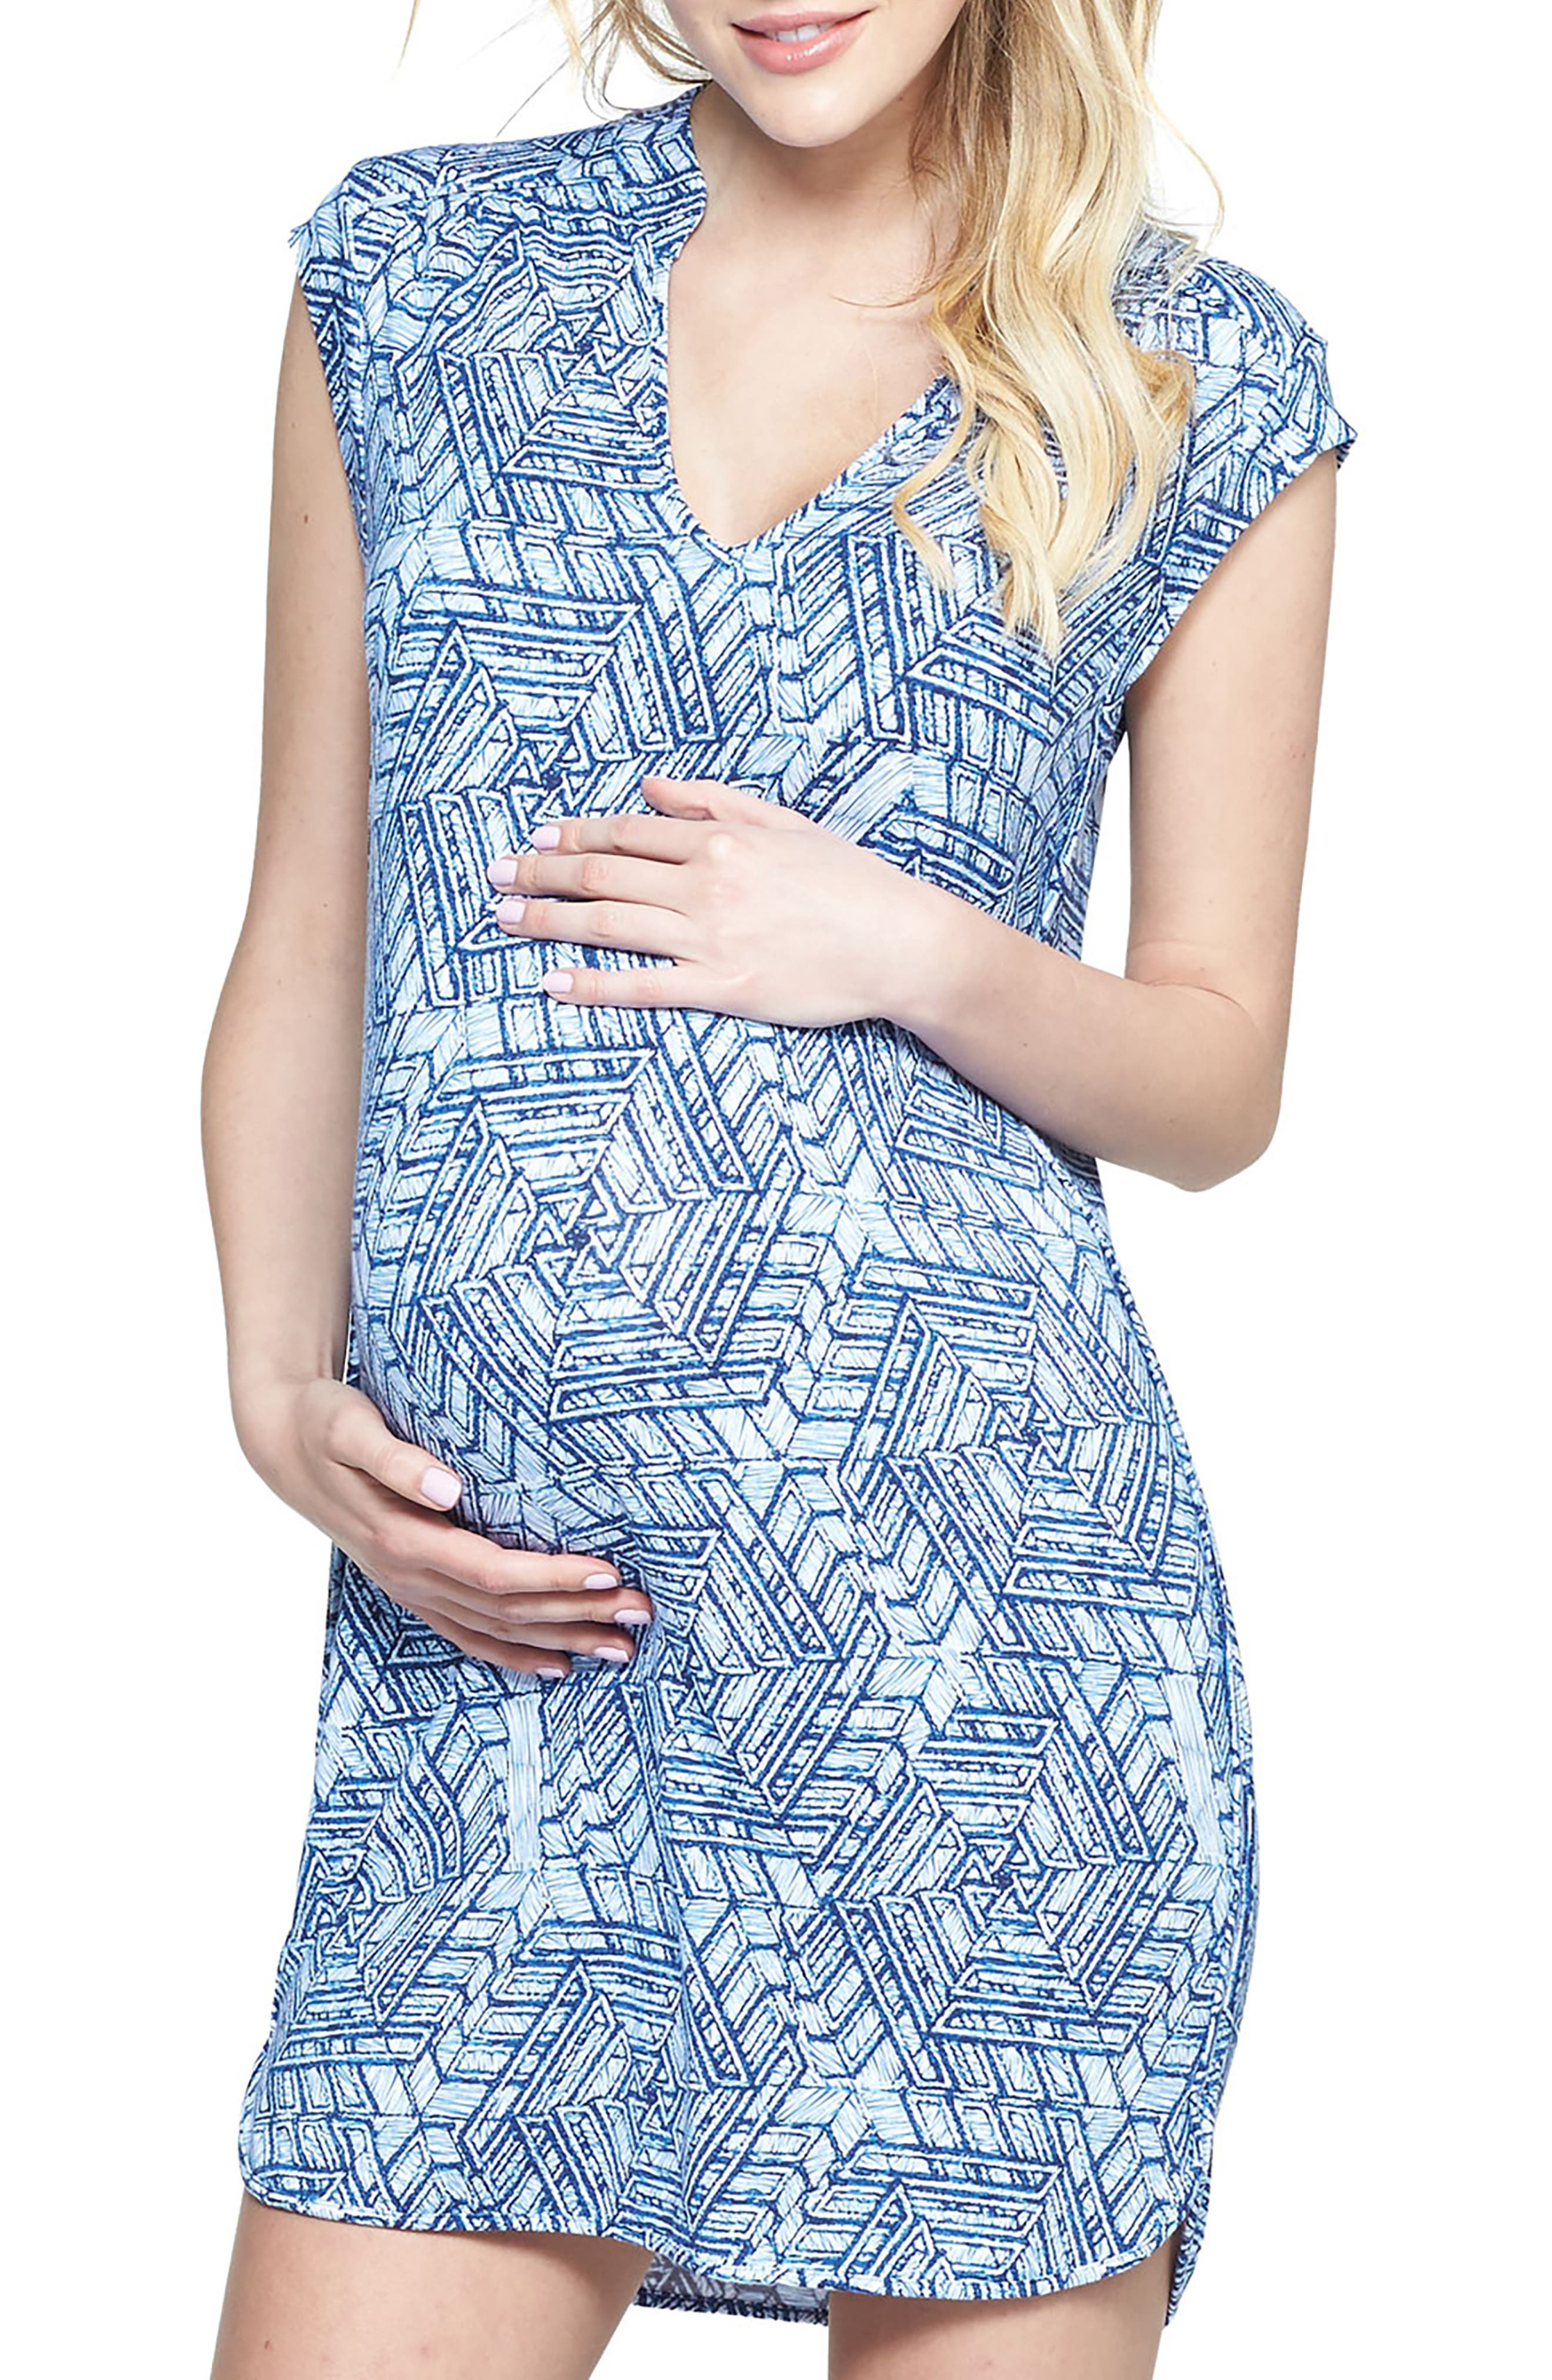 'Mellie' Embellished Neck Maternity Dress,                         Main,                         color, SCRIBBLE GEO